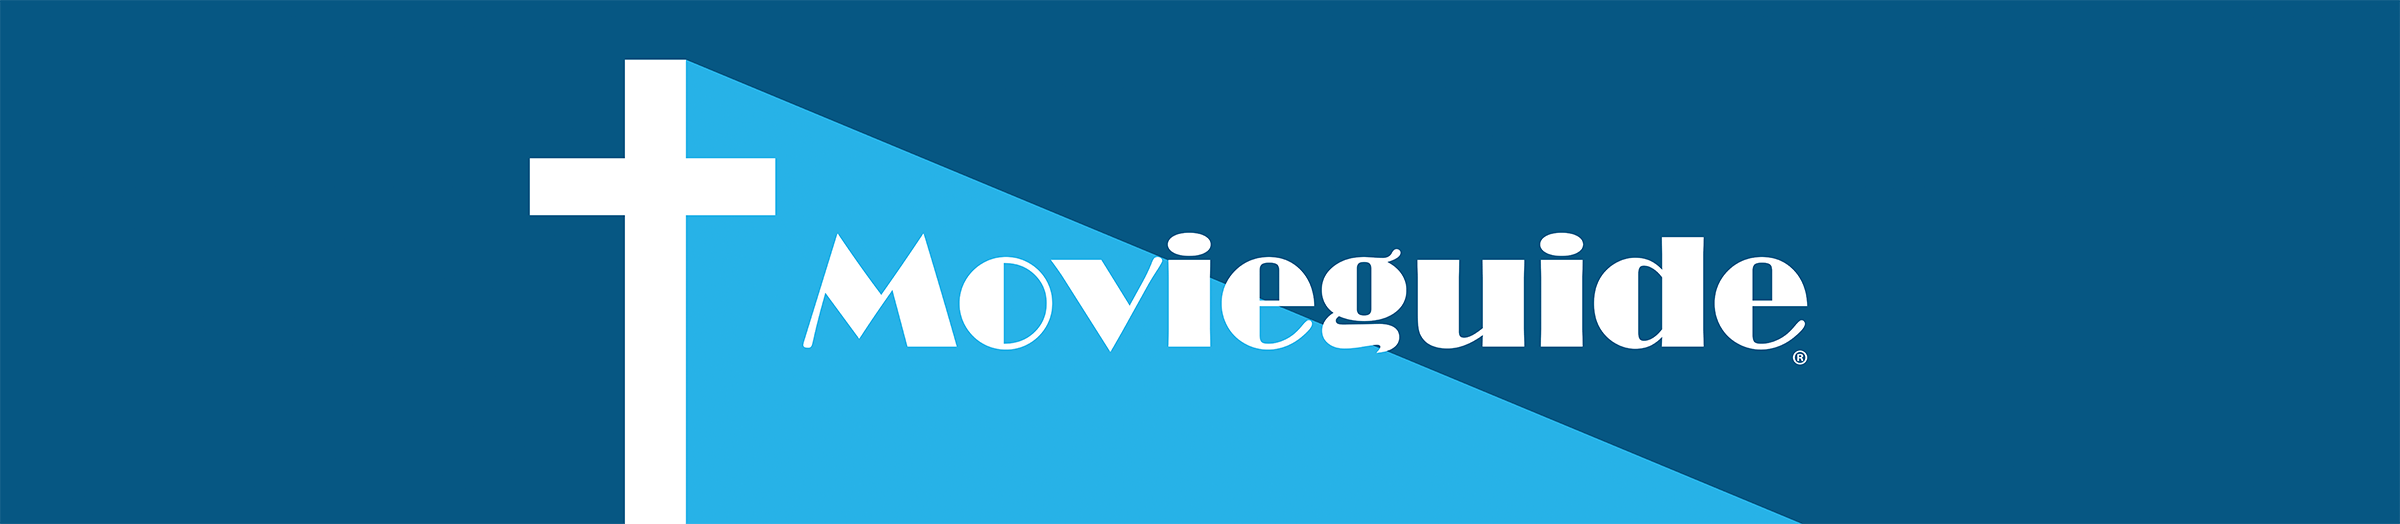 MovieguideAboutUsTitleSmaller